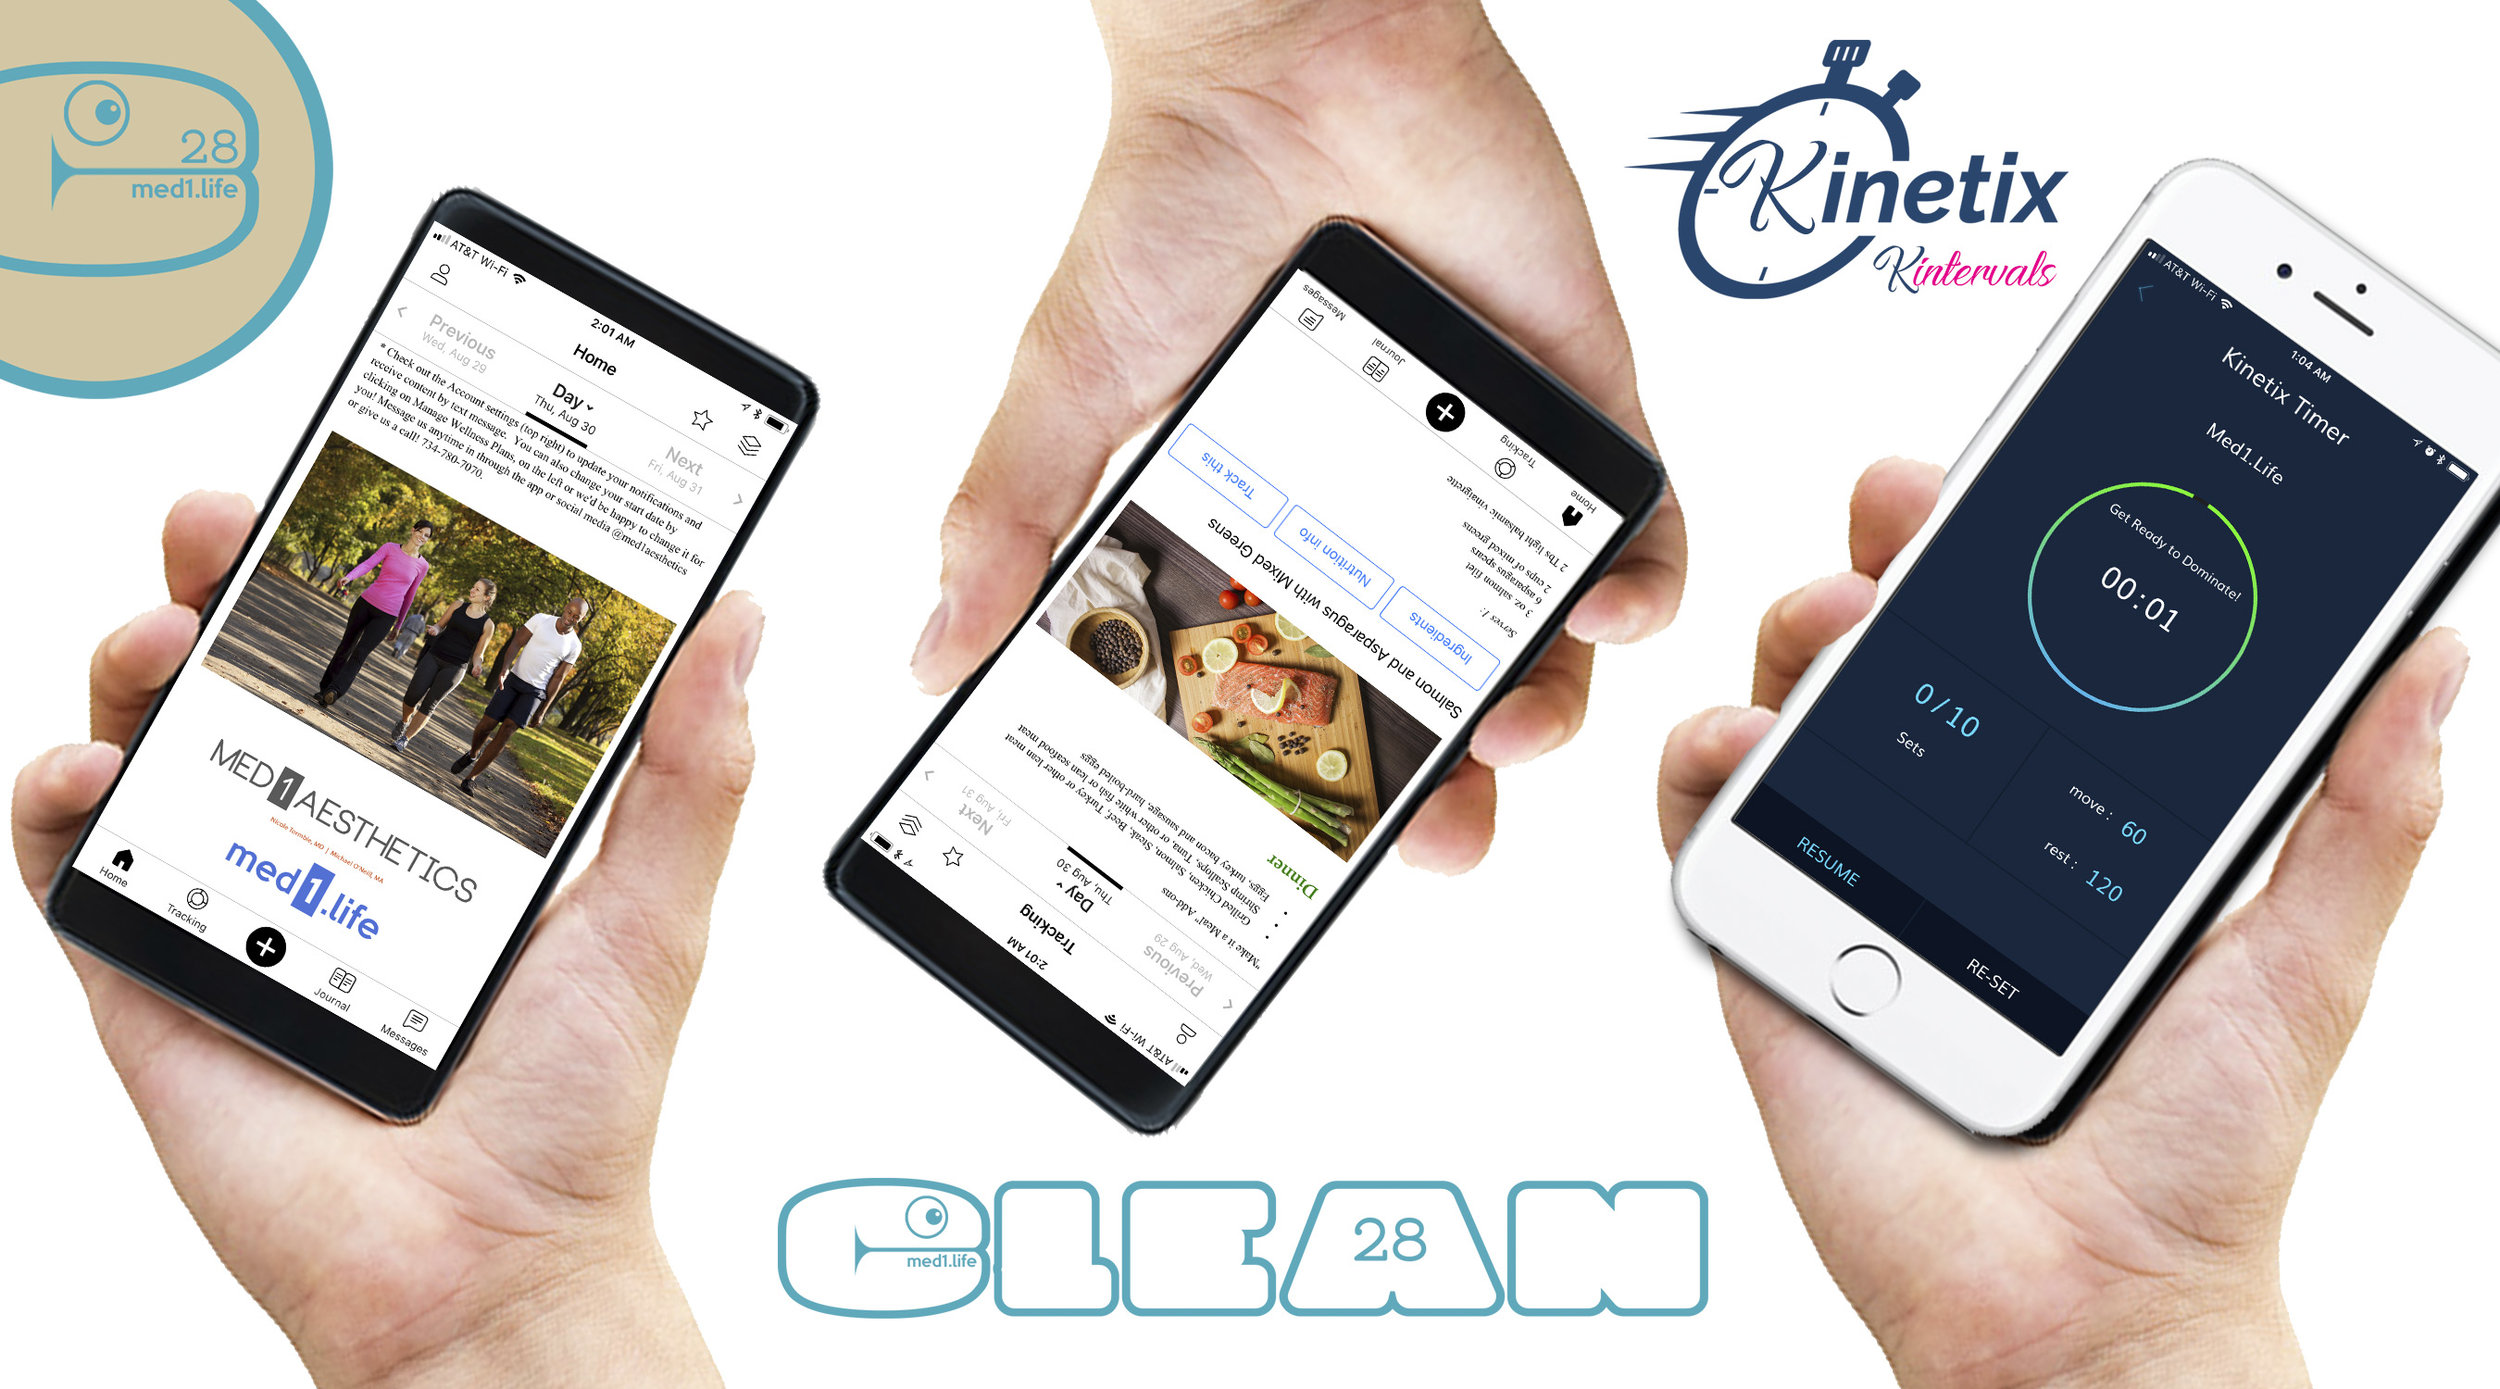 3 hand app cover image.jpg